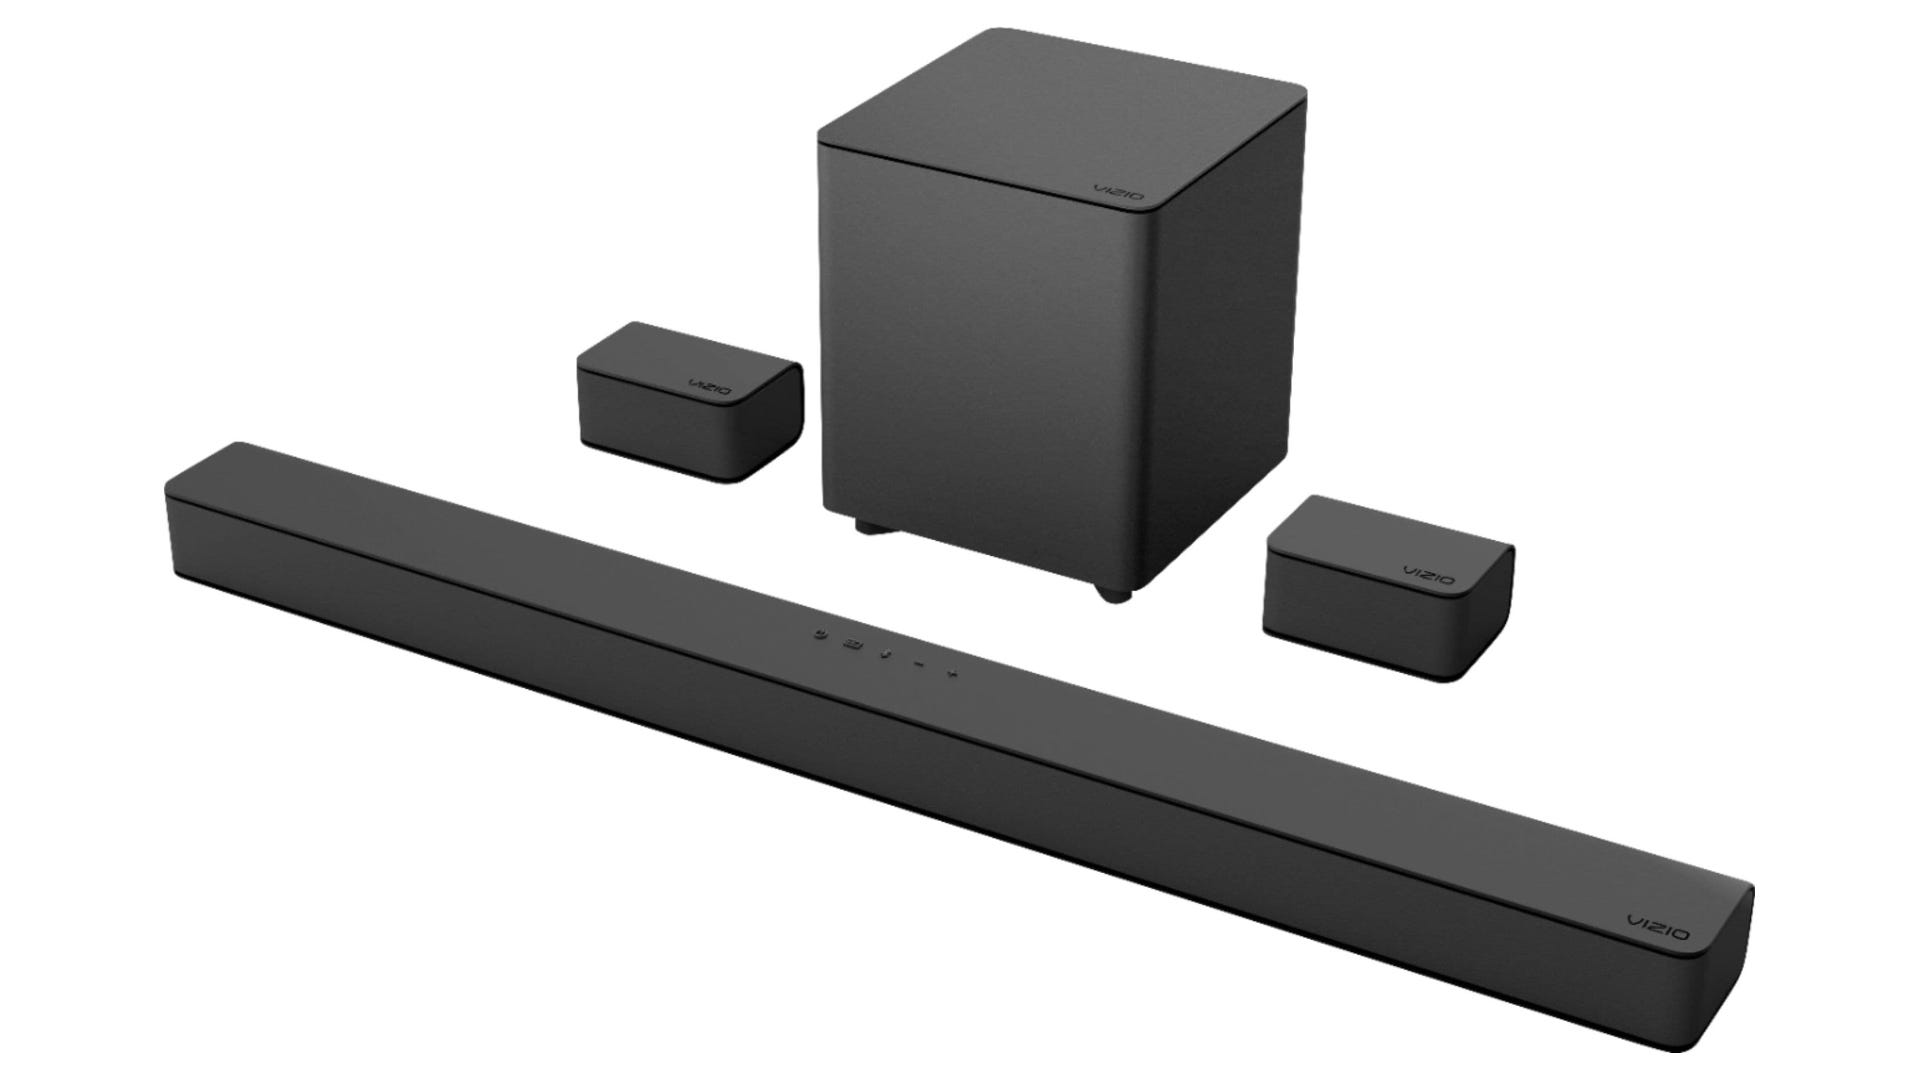 Vizio V Series V51-H6 soundbar render